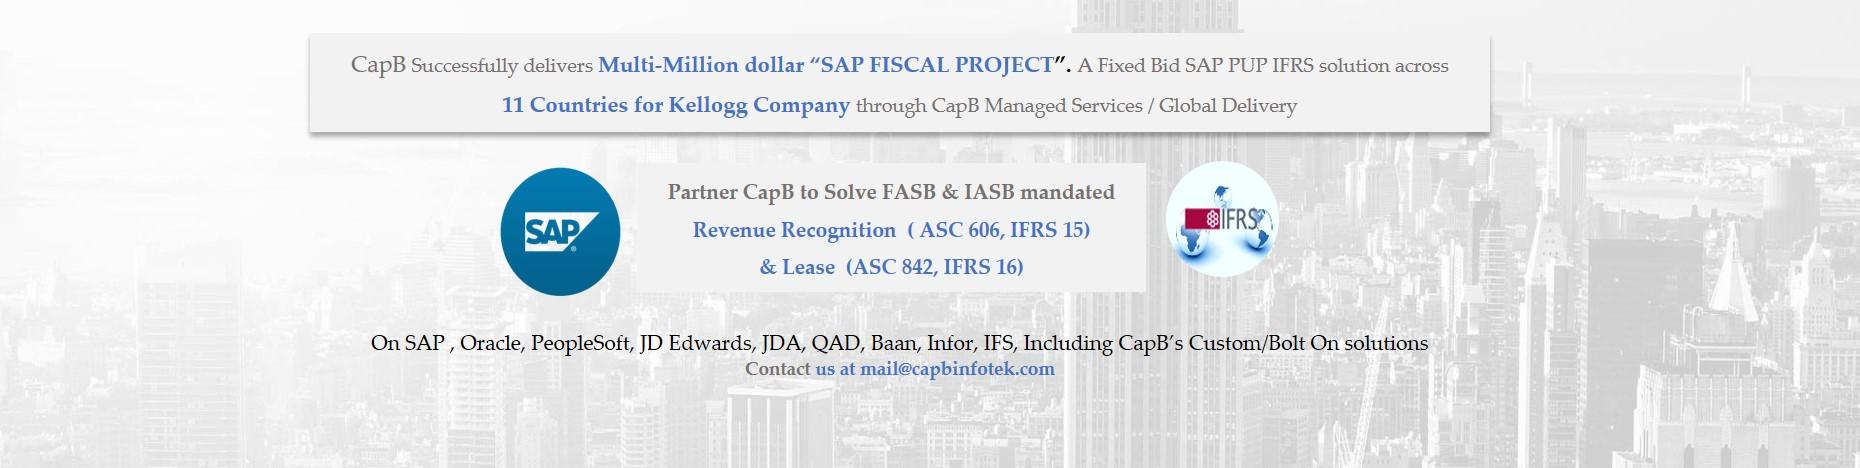 CapBs-Kelloggs-success-IFRS-15-IFRS-16-SOLUTION-ASC-606-ASC-842-FASB-IASB-MANDATE-SAP-2